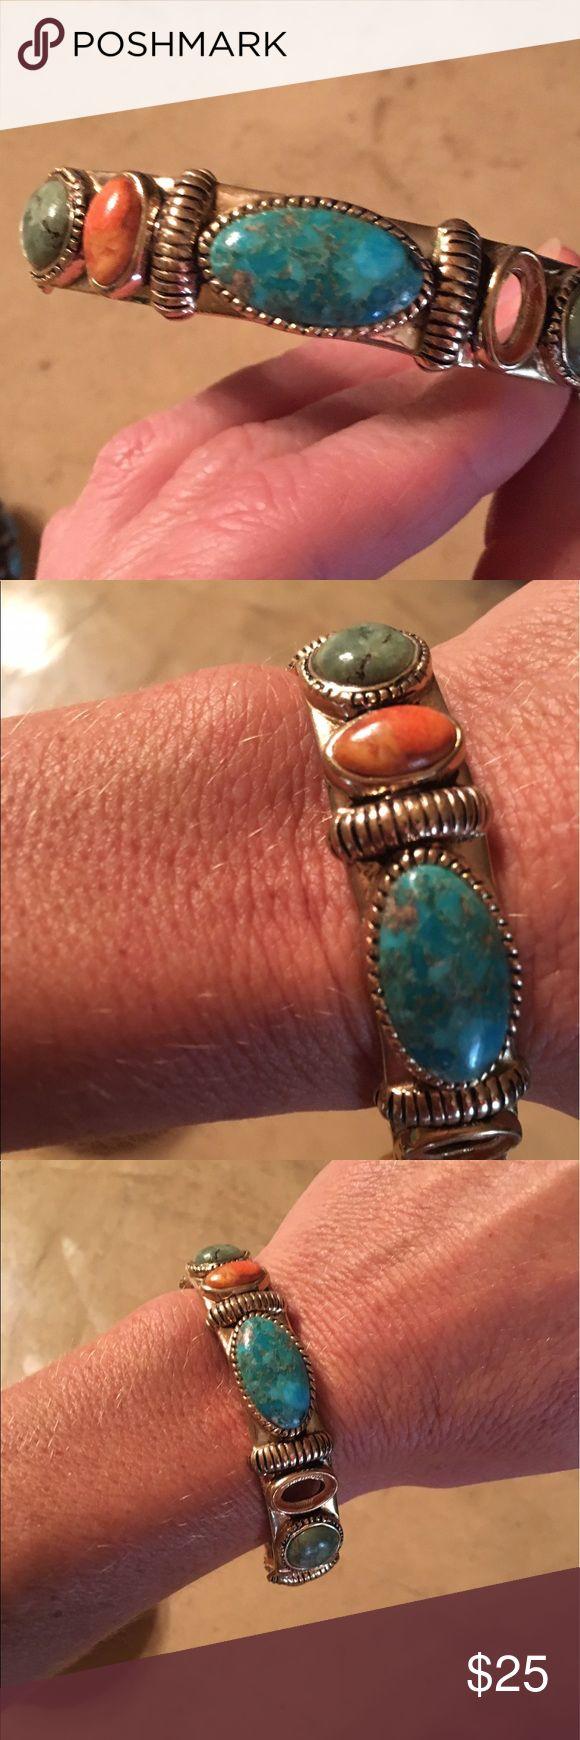 Studio Barse Gold Bracelet Studio Bars Bracelet, coral, turquoise, green real stones! The designer has beautiful jewelry!! So sad that I lost a stone! I can be hard on my jewelry! Studio Barse Jewelry Bracelets